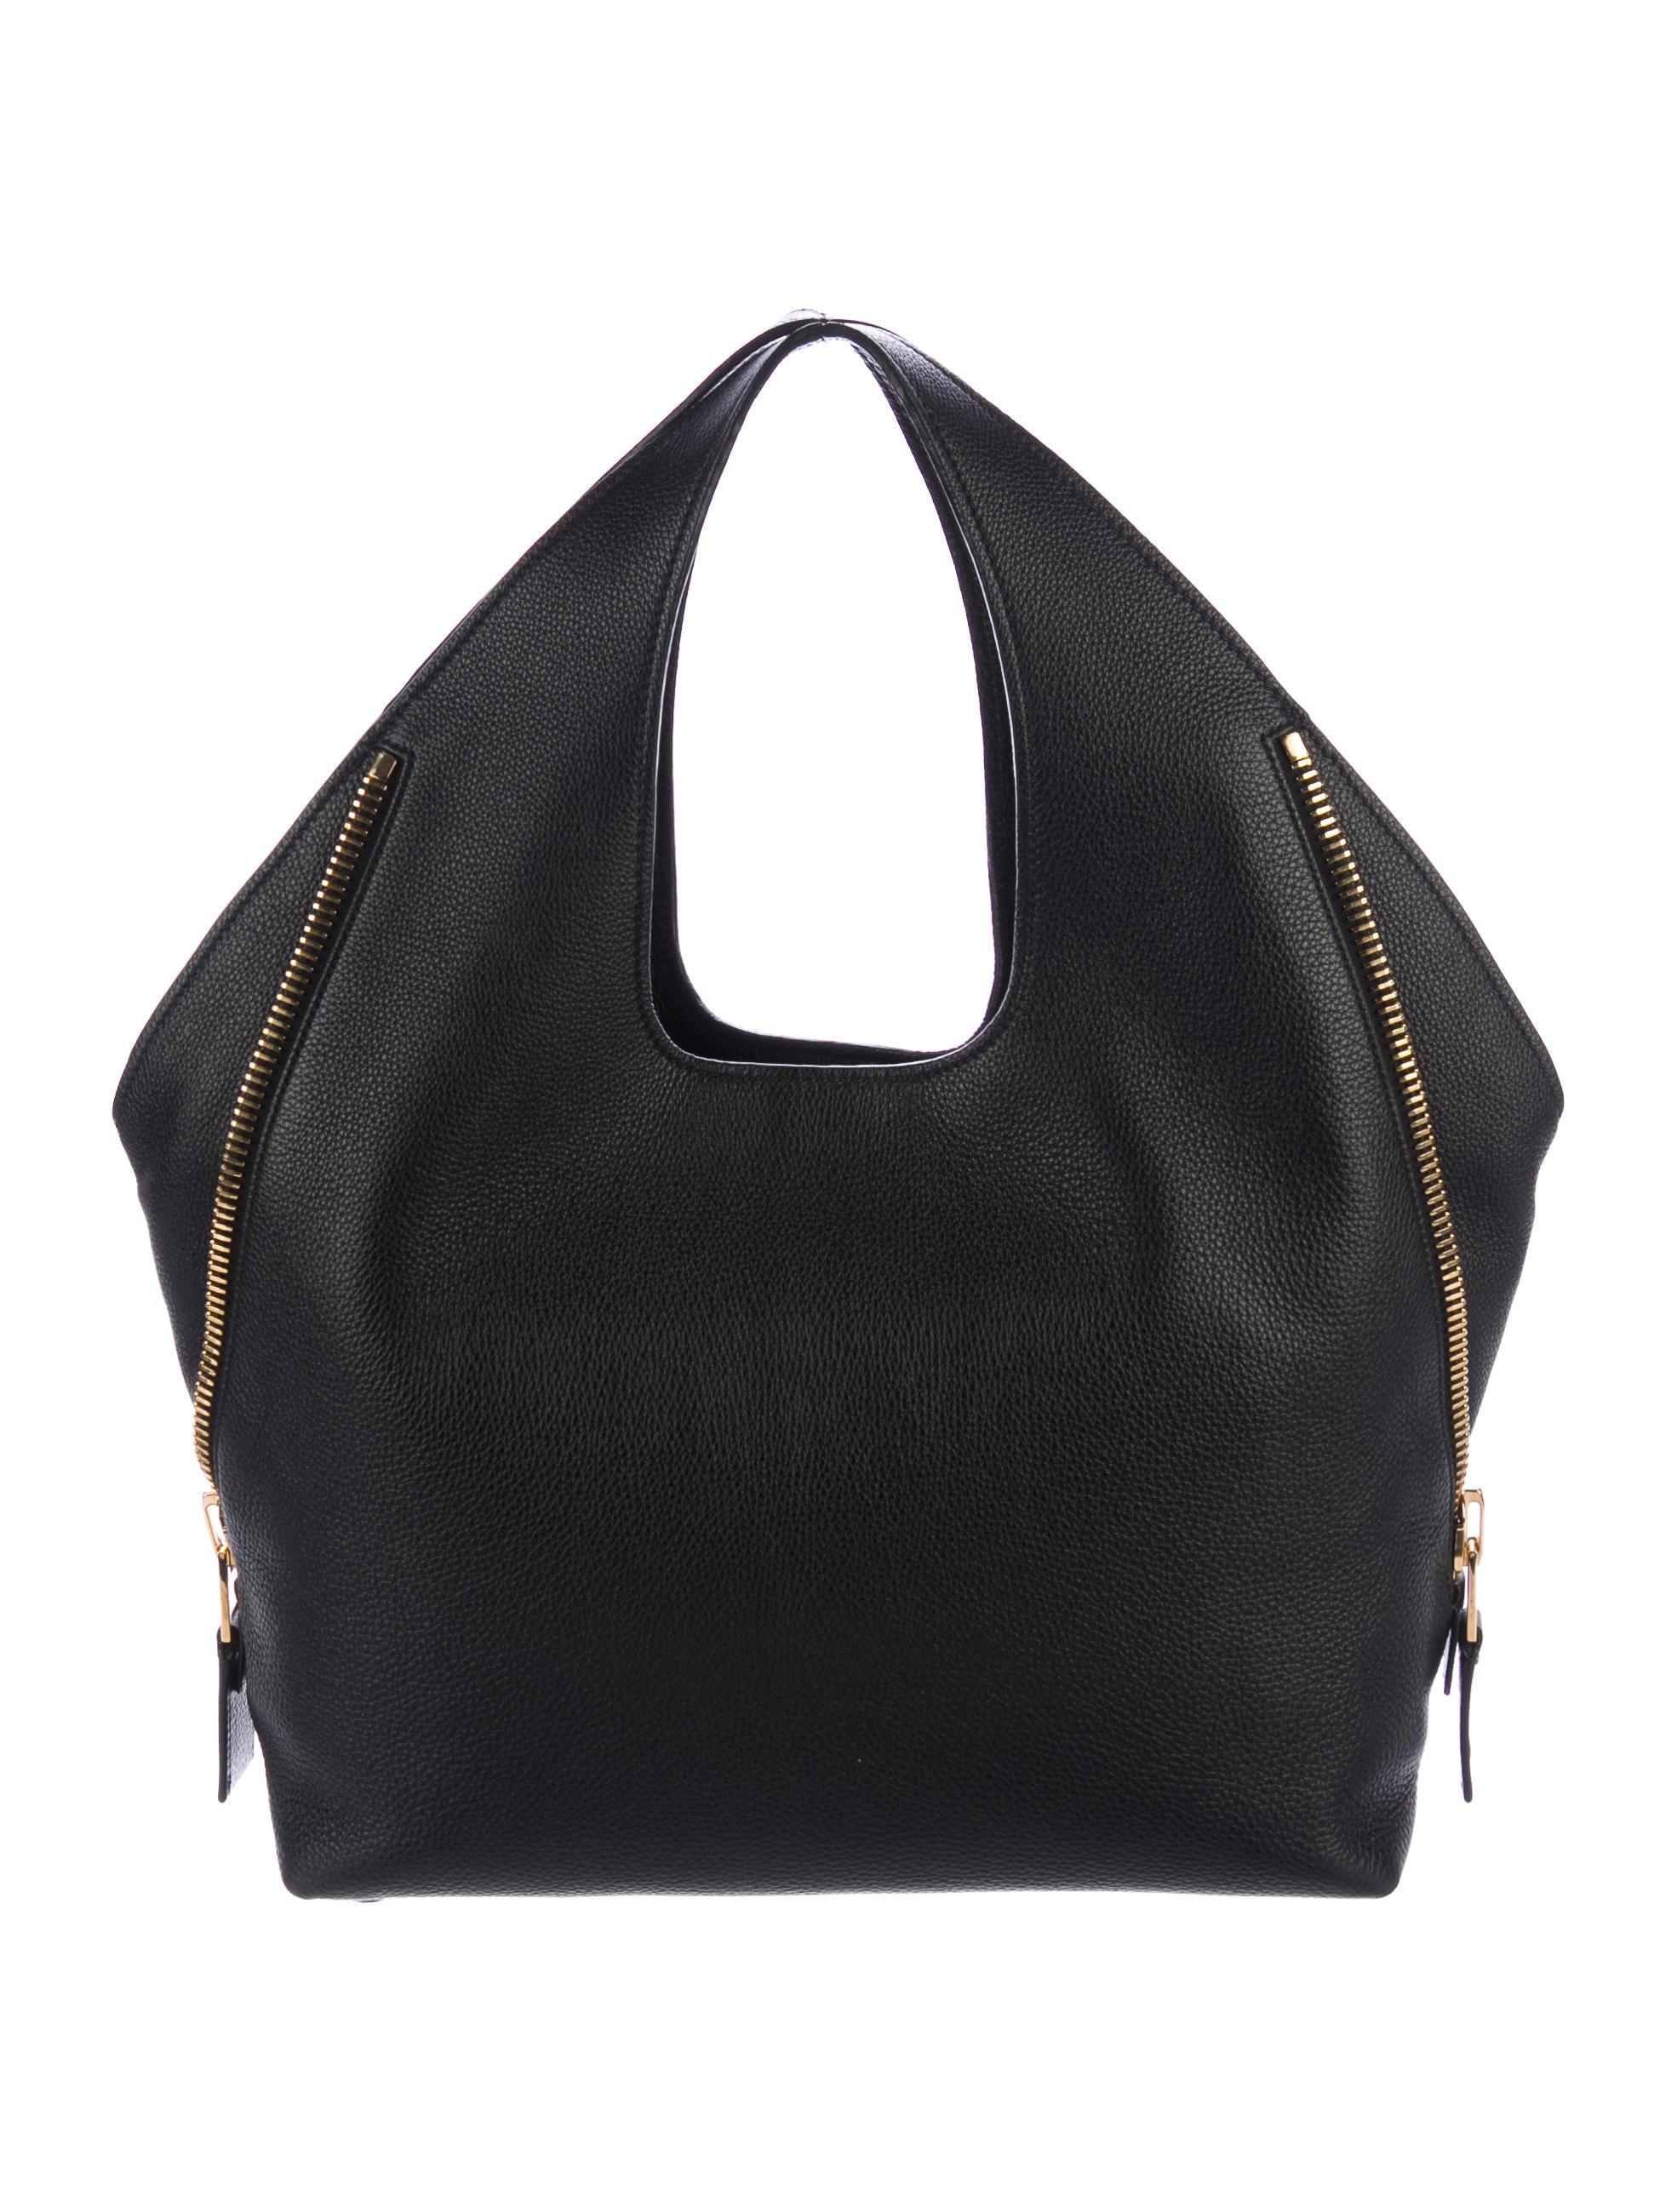 94cbbacae184d8 Tom Ford Jennifer Side-Zip Leather Hobo - Handbags - TOM37226   The ...